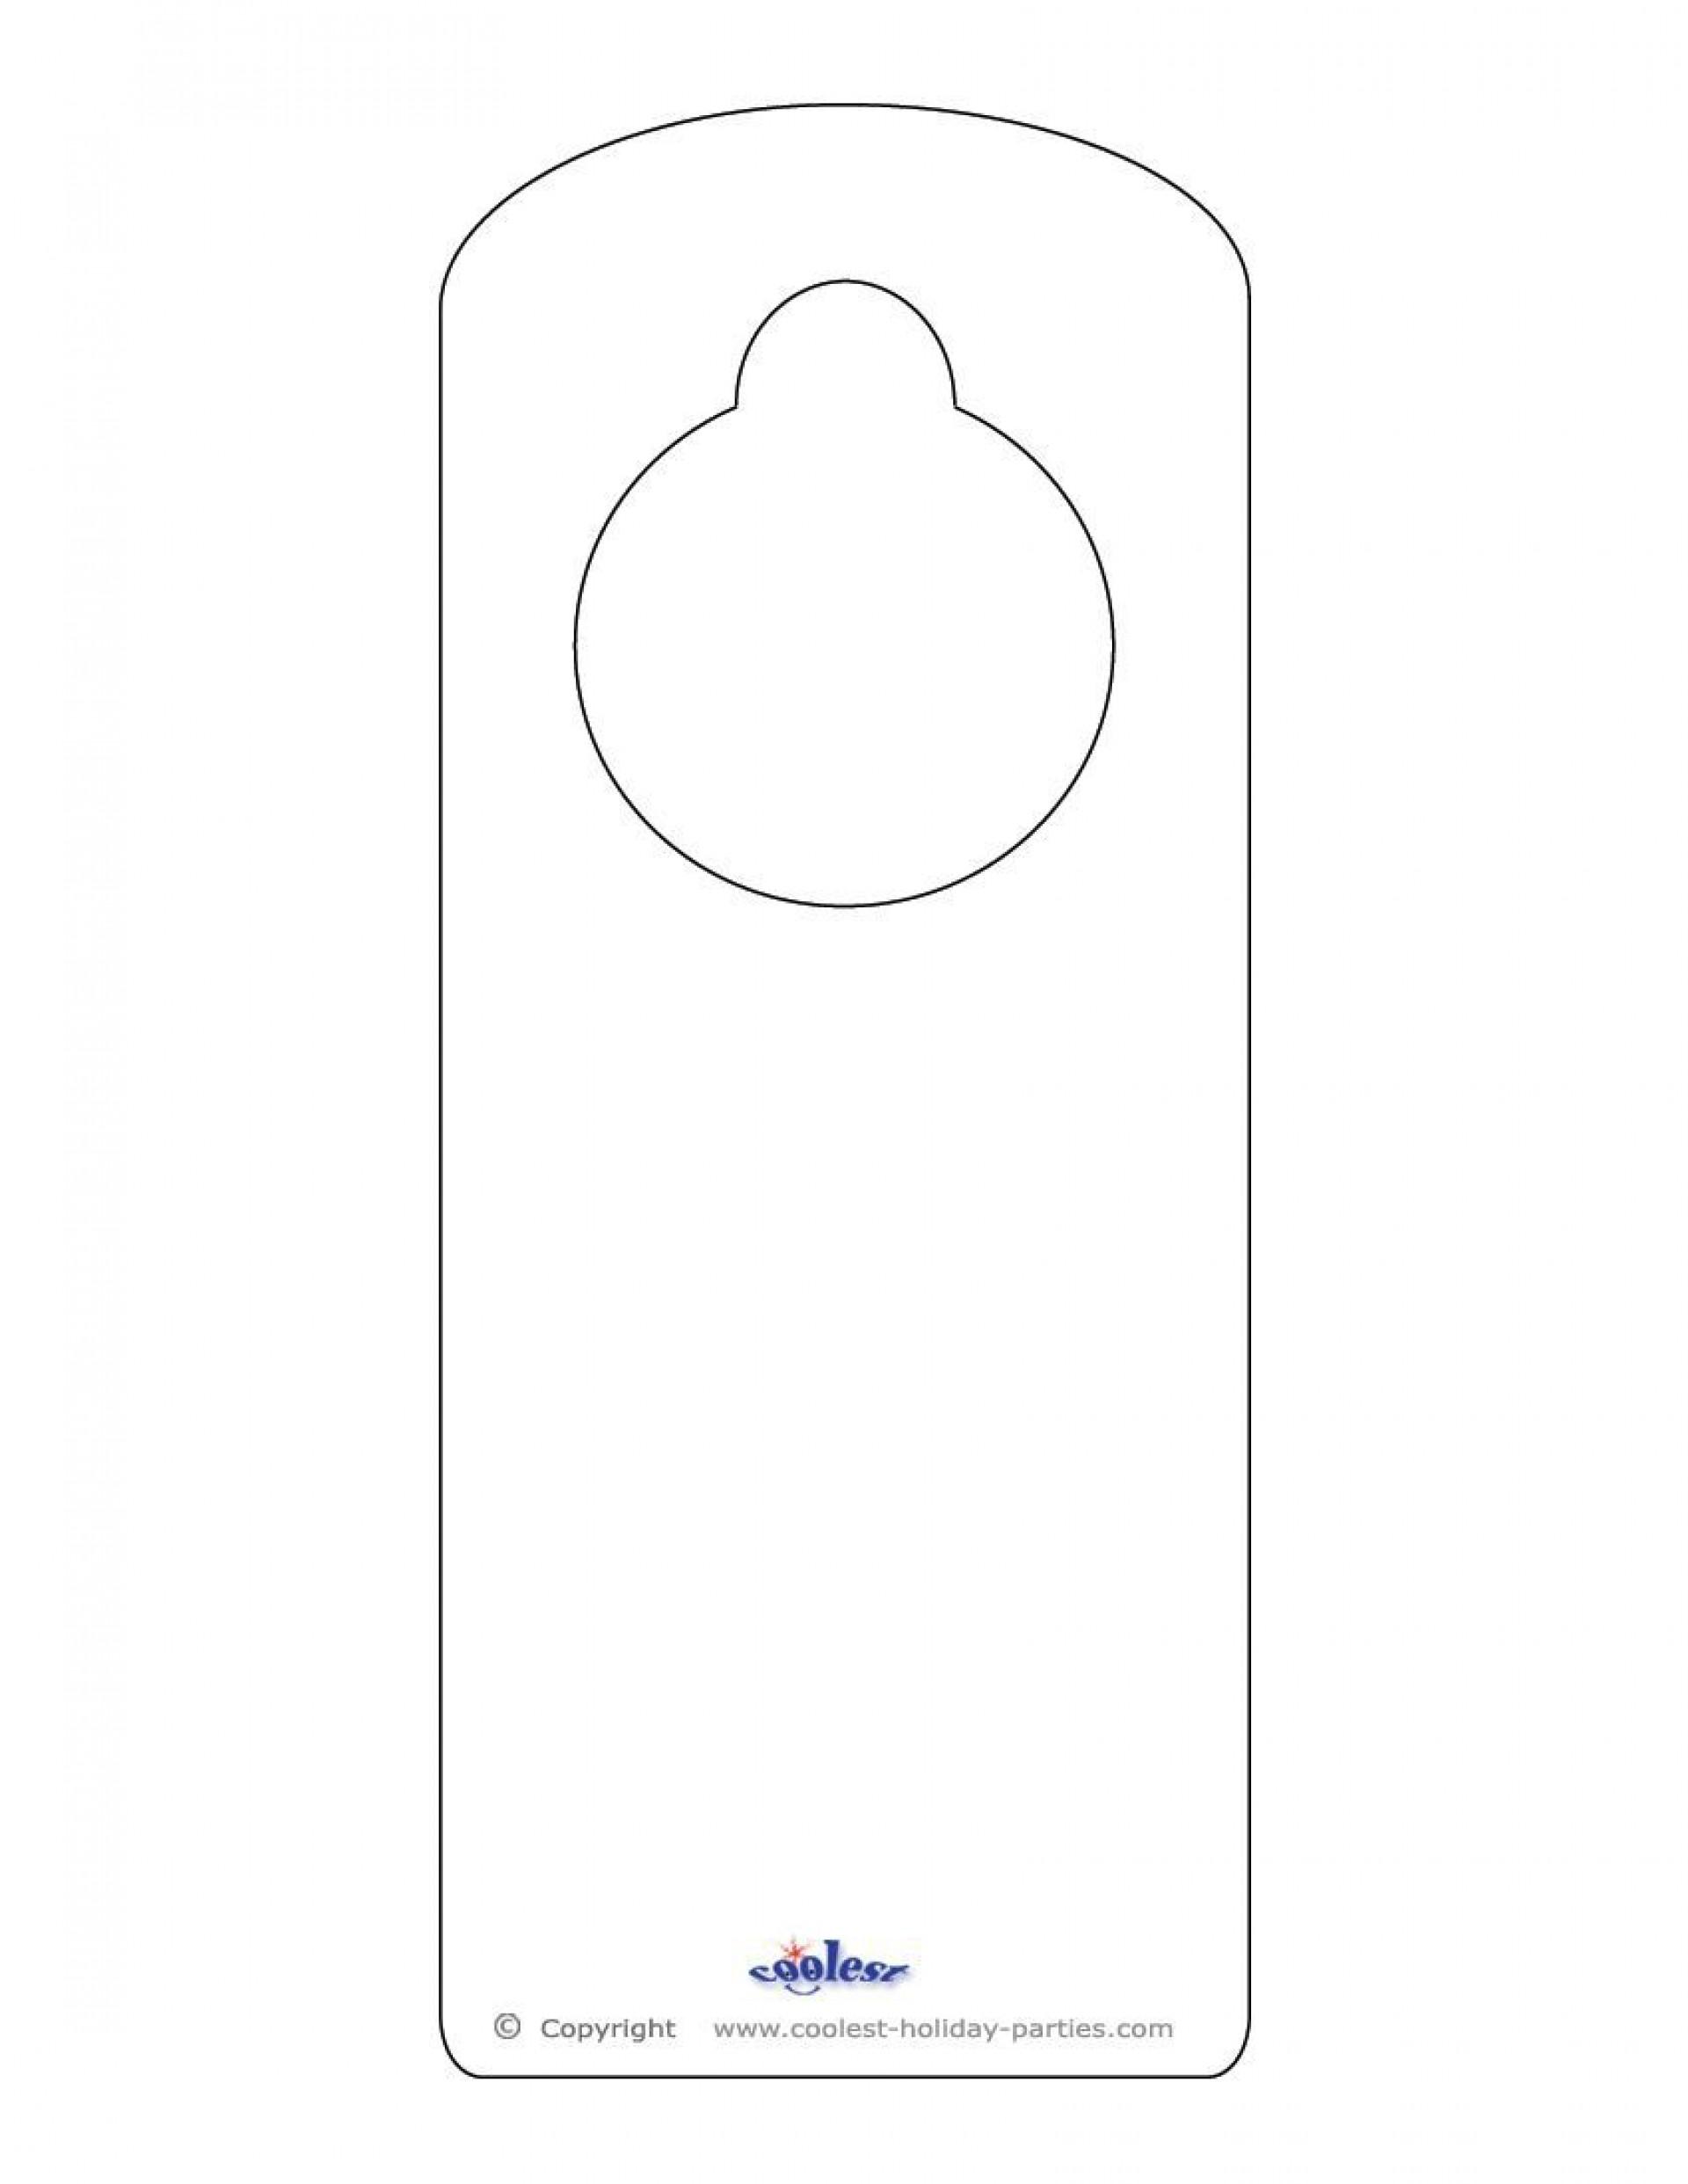 008 Unbelievable Free Printable Template For Door Hanger High Definition 1920